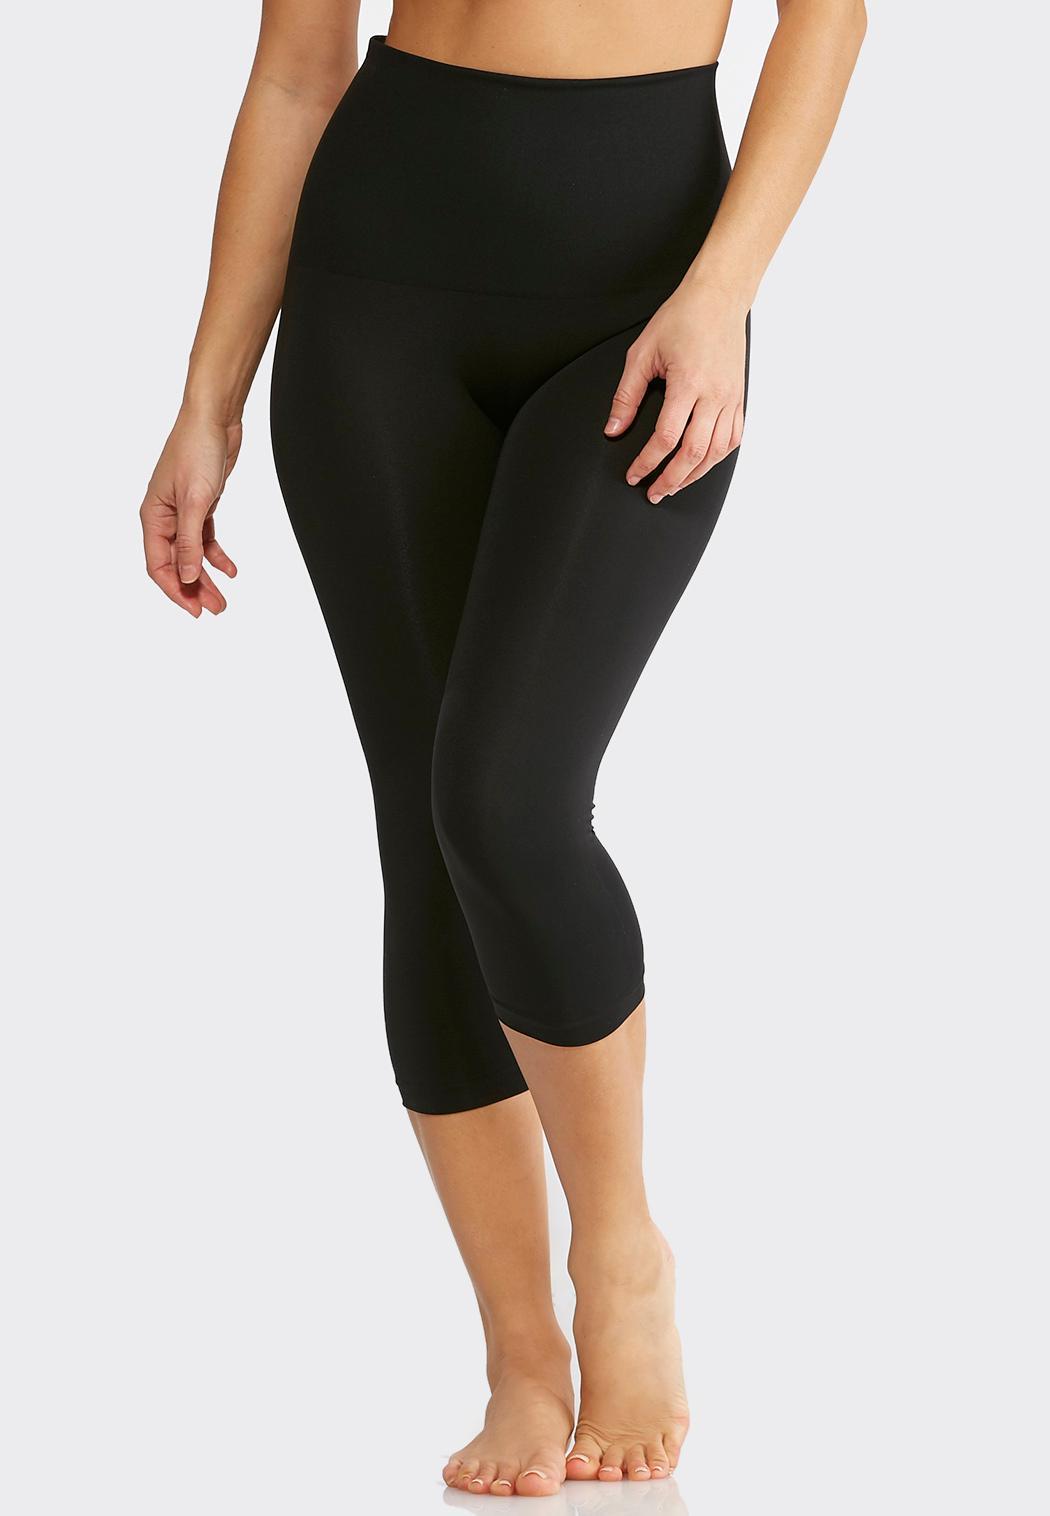 44f6c0b1e Women s Plus Size Shapewear